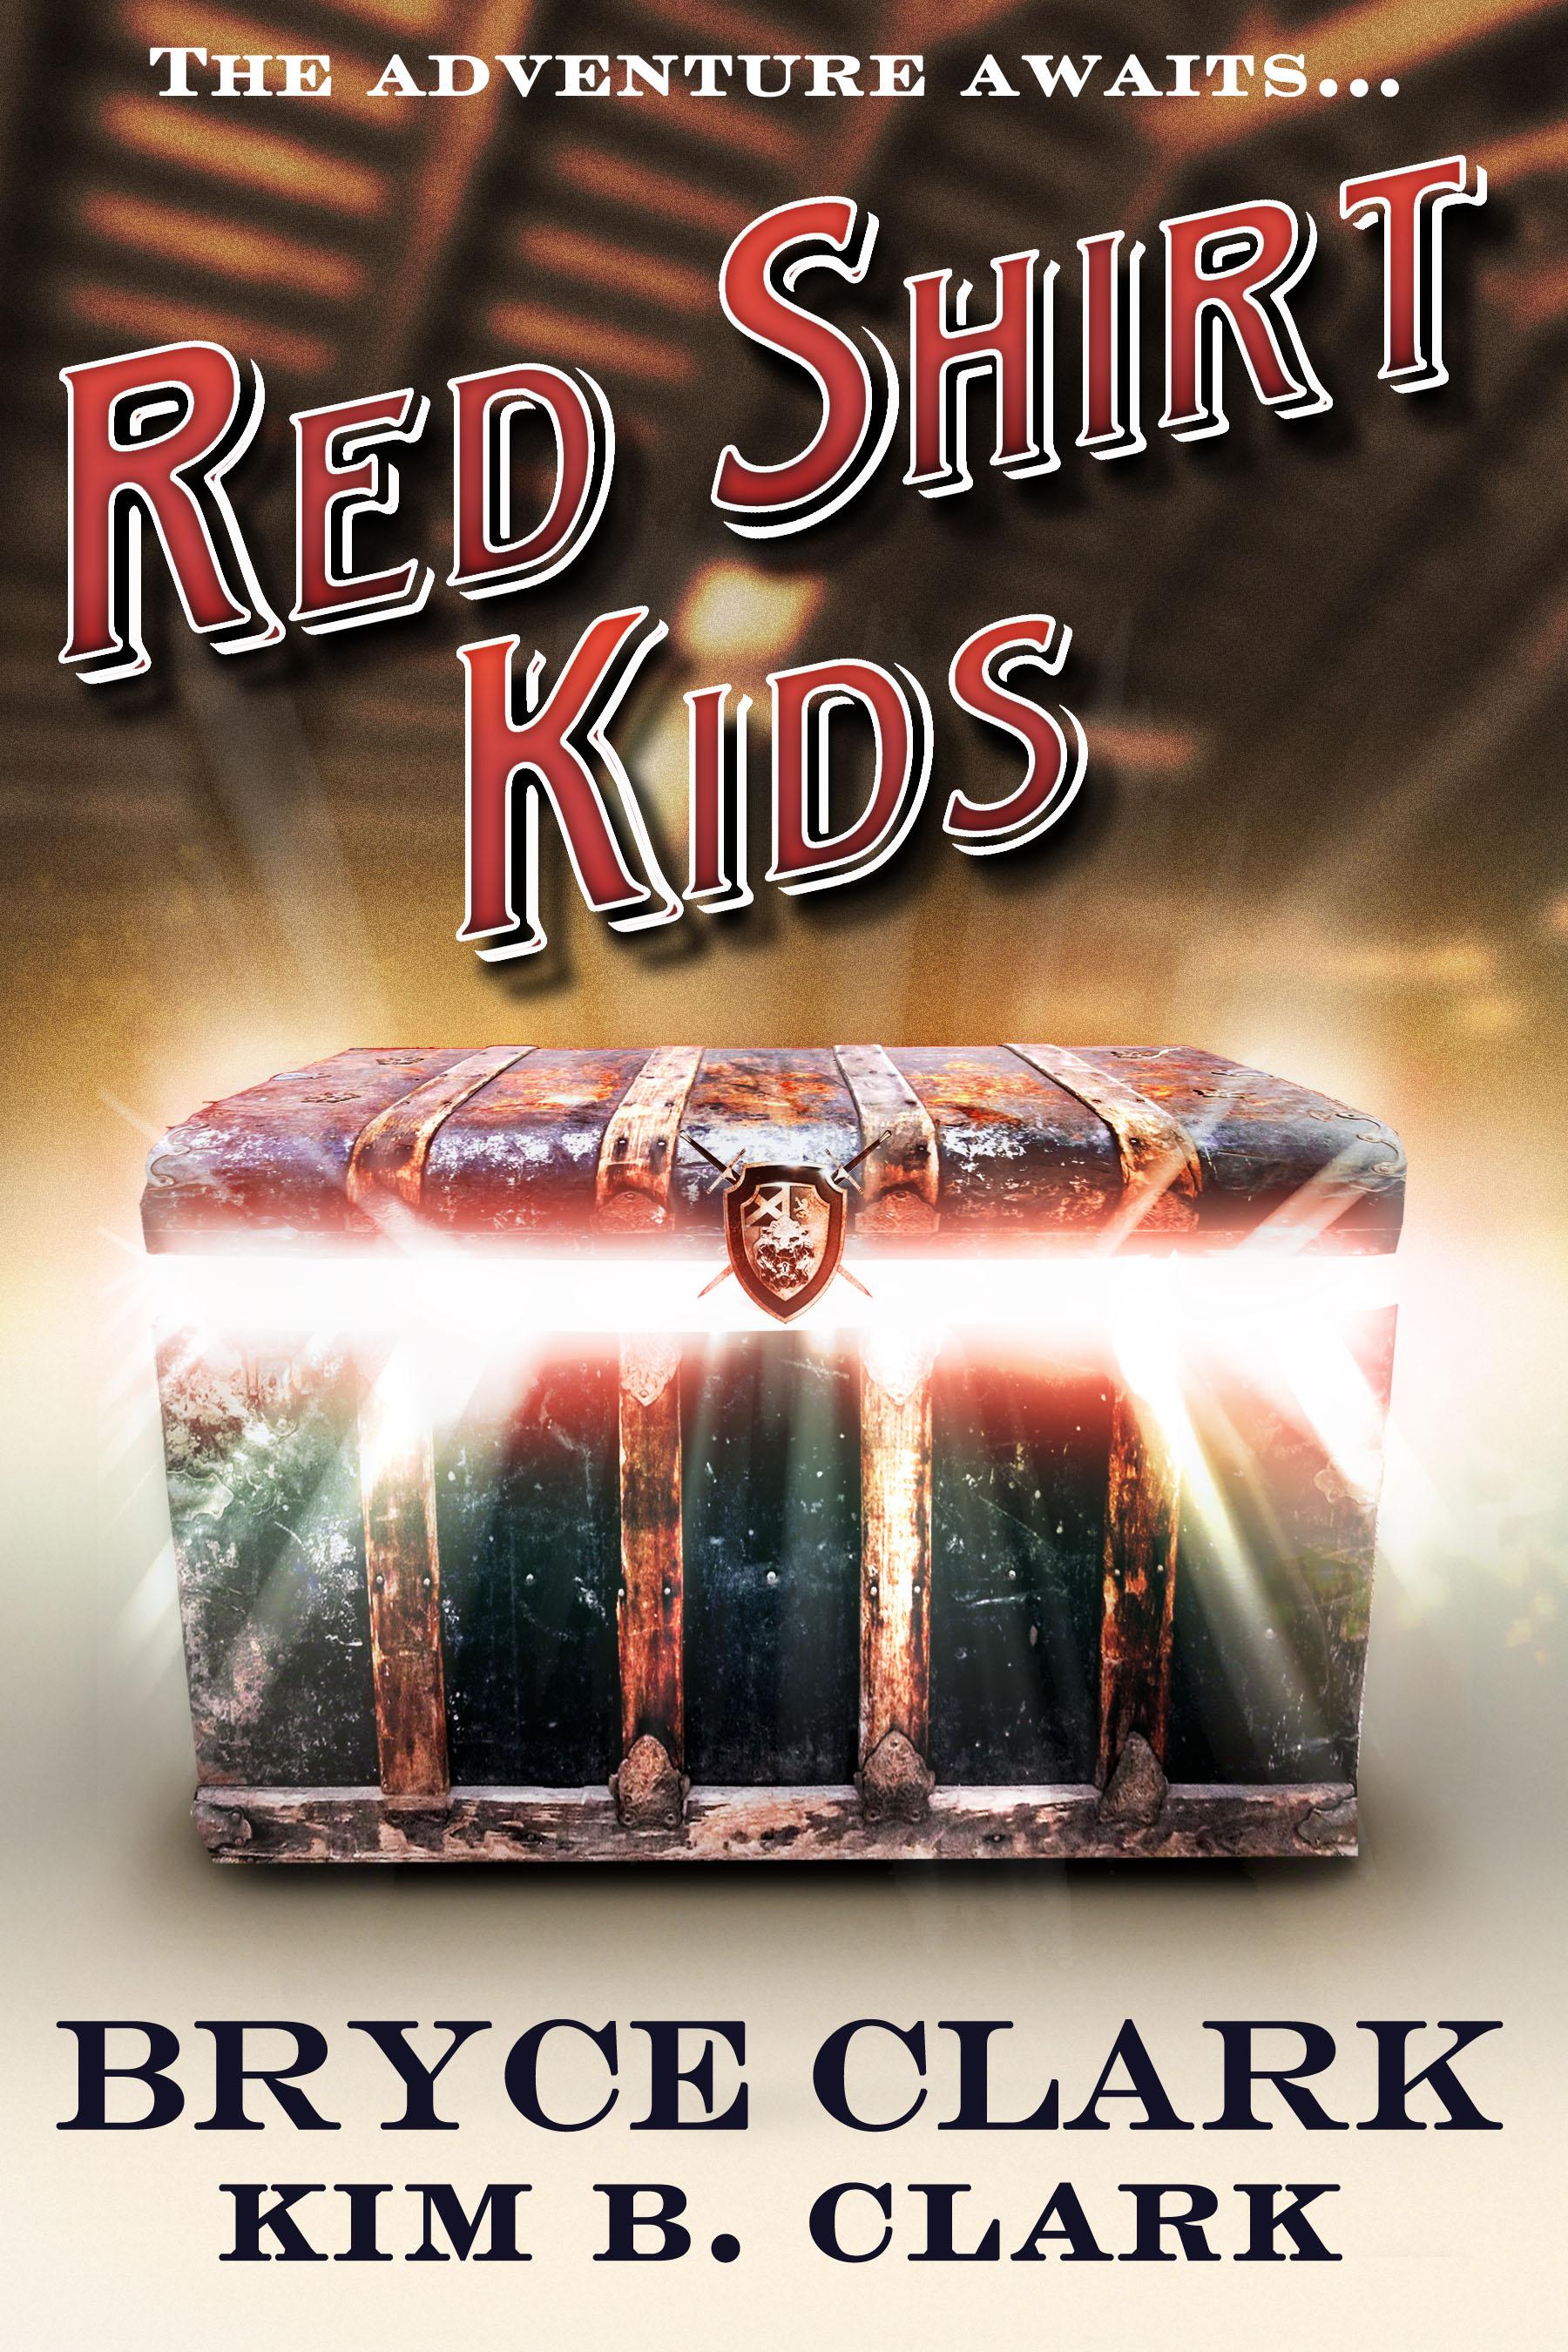 Red-Shirt-Kids